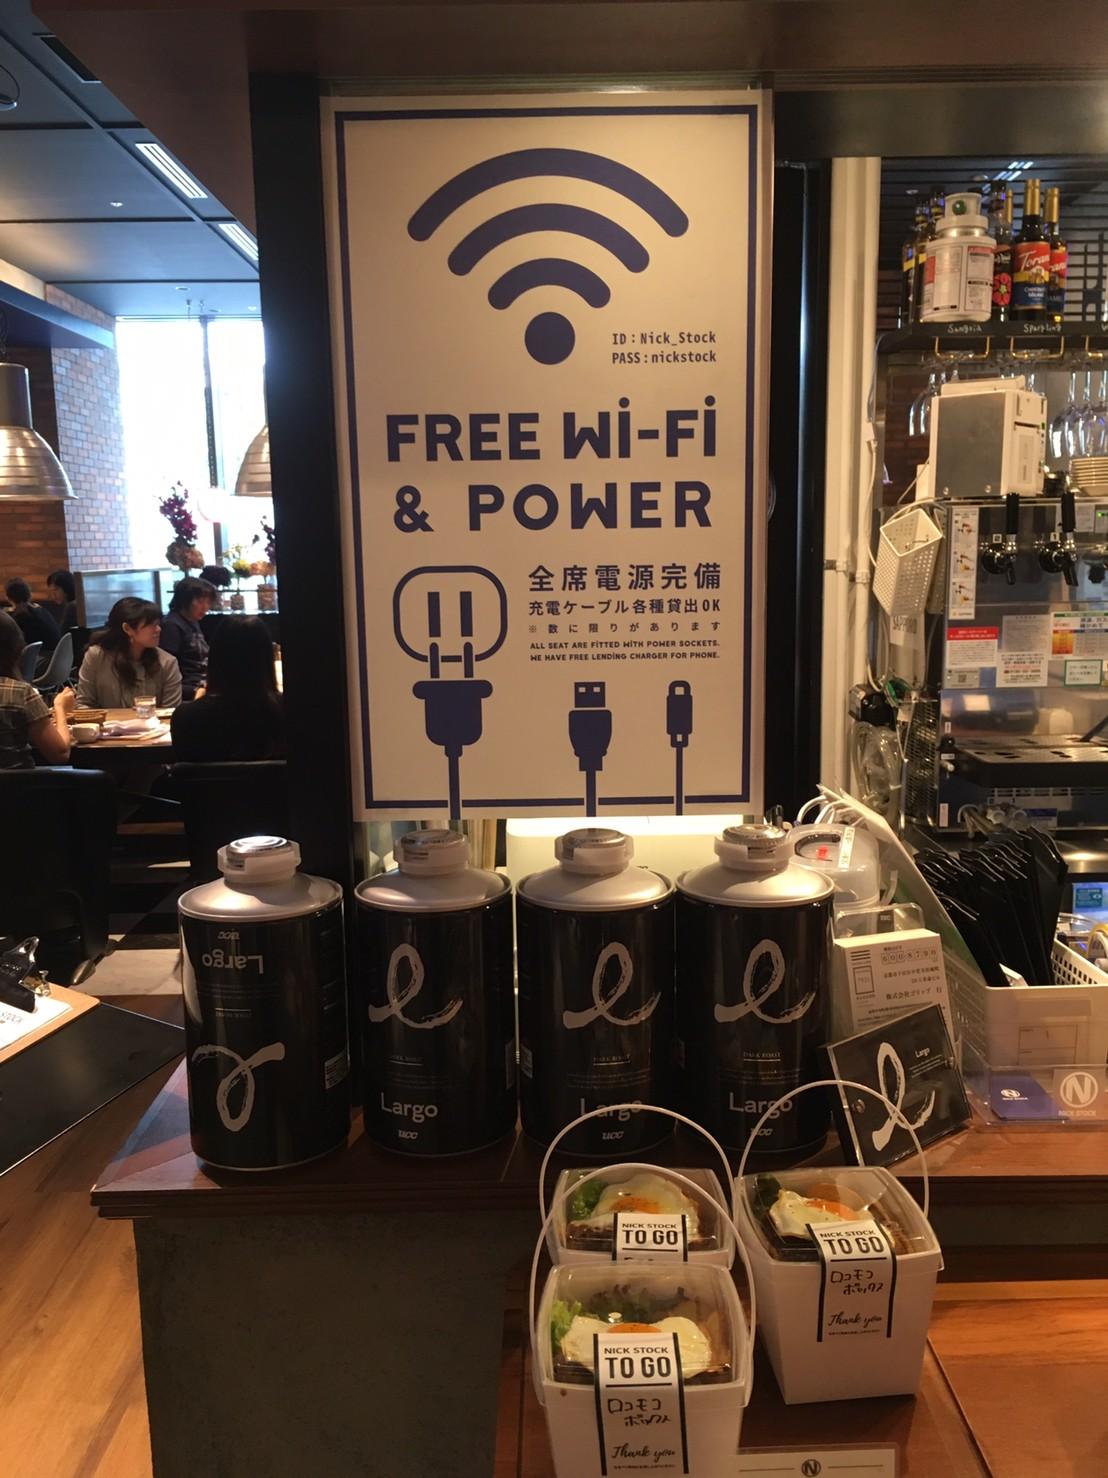 NICK STOCK ムスブ田町店 Wi-Fi